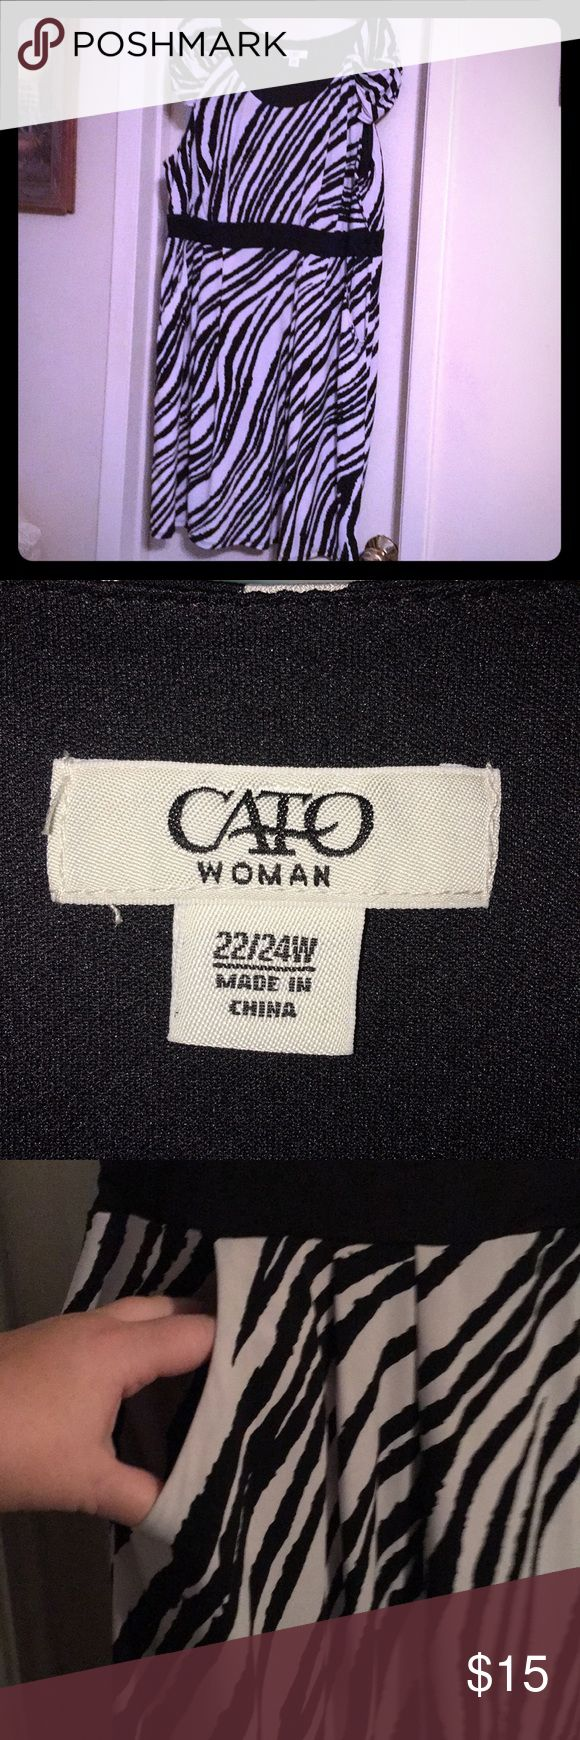 Cato 22/24w above the knee zebra print dress Cato 22/24w above the knee zebra print dress with pockets.  I wore it as a maternity dress. Cato Dresses Midi